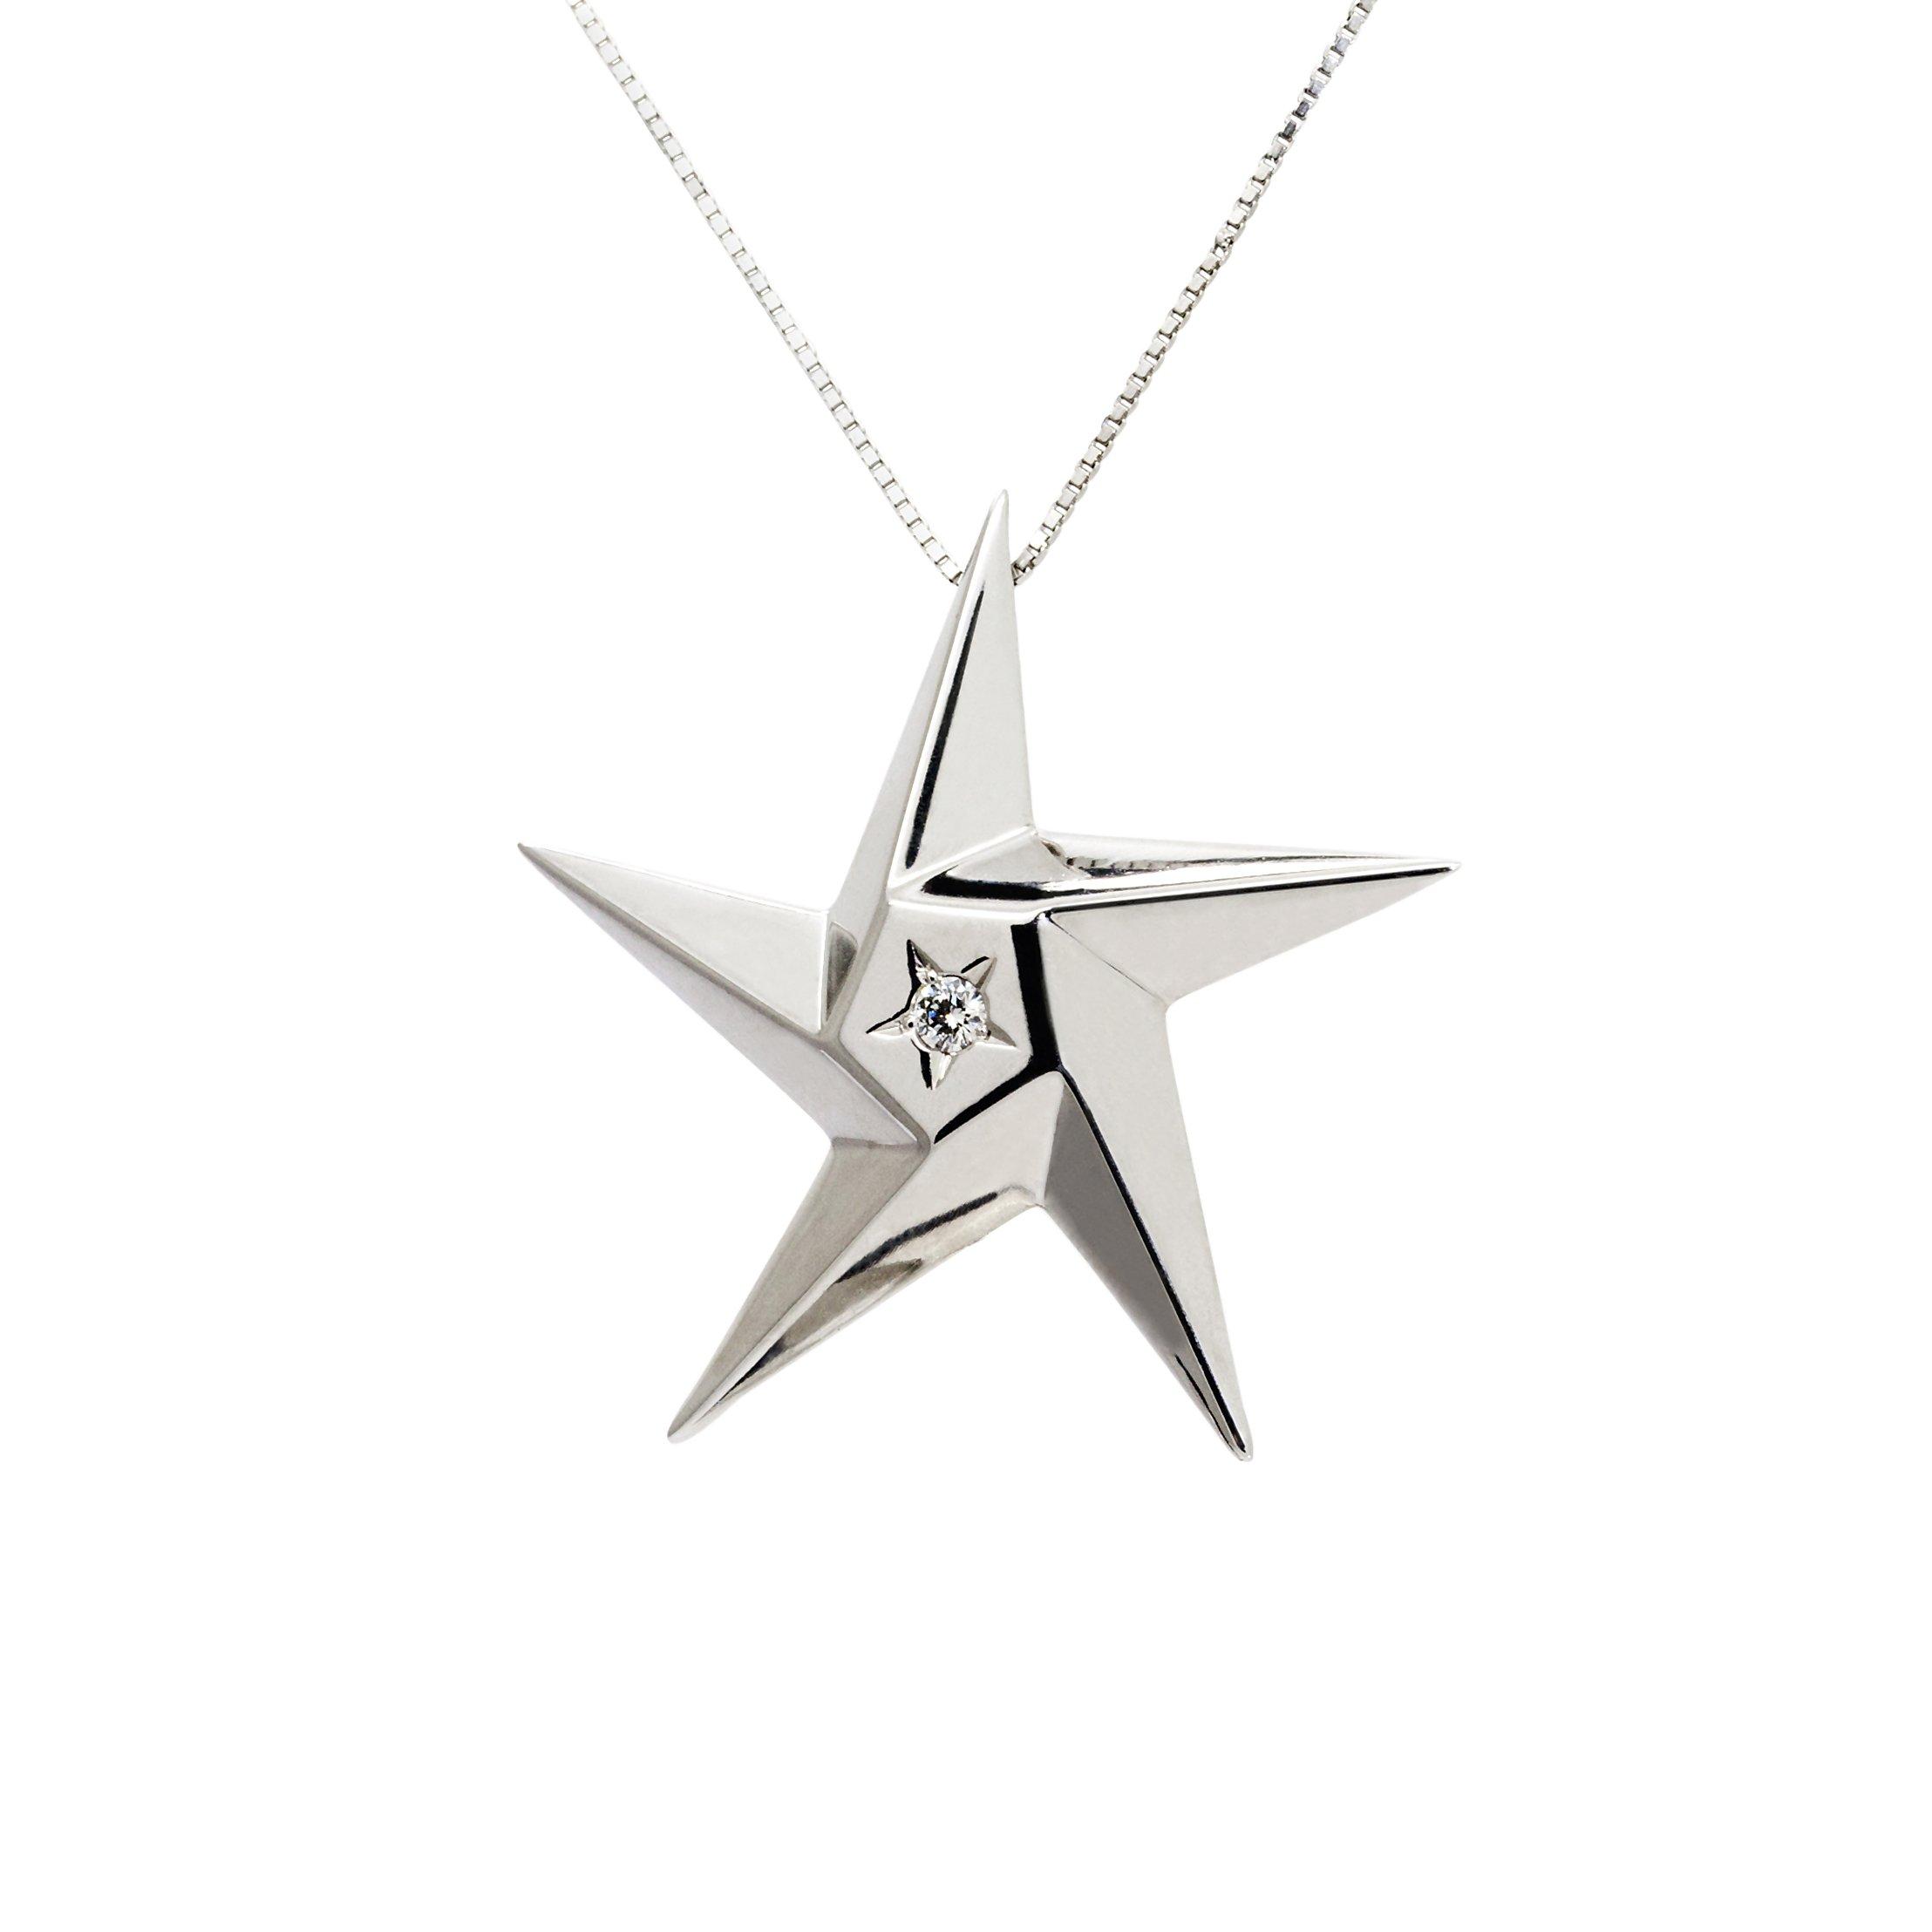 Daou Jewellery 18kt Gold & Black Diamond Day & Night Star Pendant - 16 fpn6Y0m4n